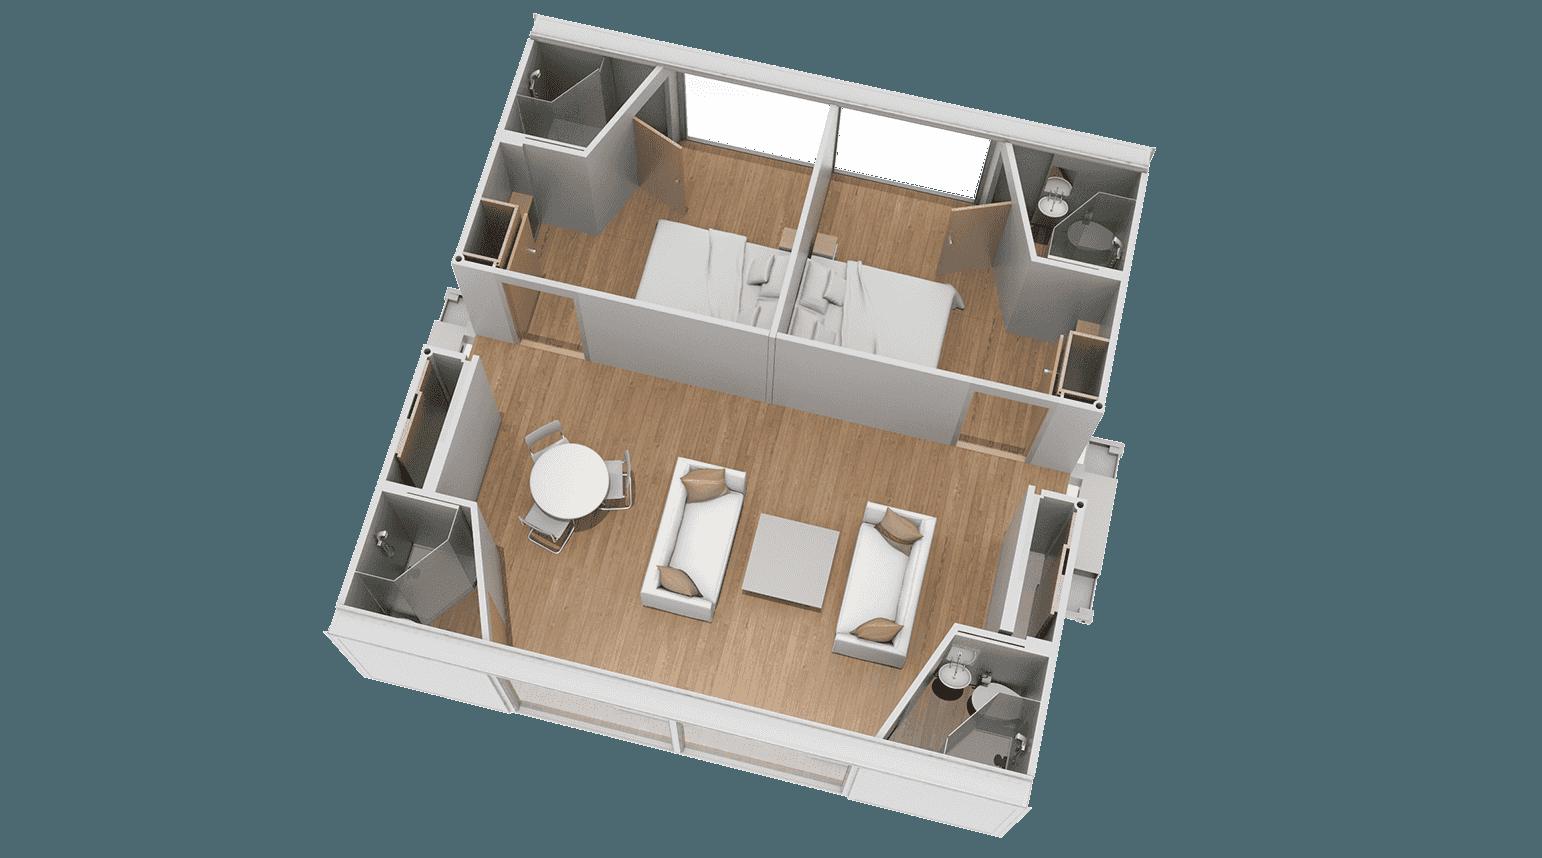 ten-fold-engineering-tf-64-maisons-pliables-transportables-par-camion-11